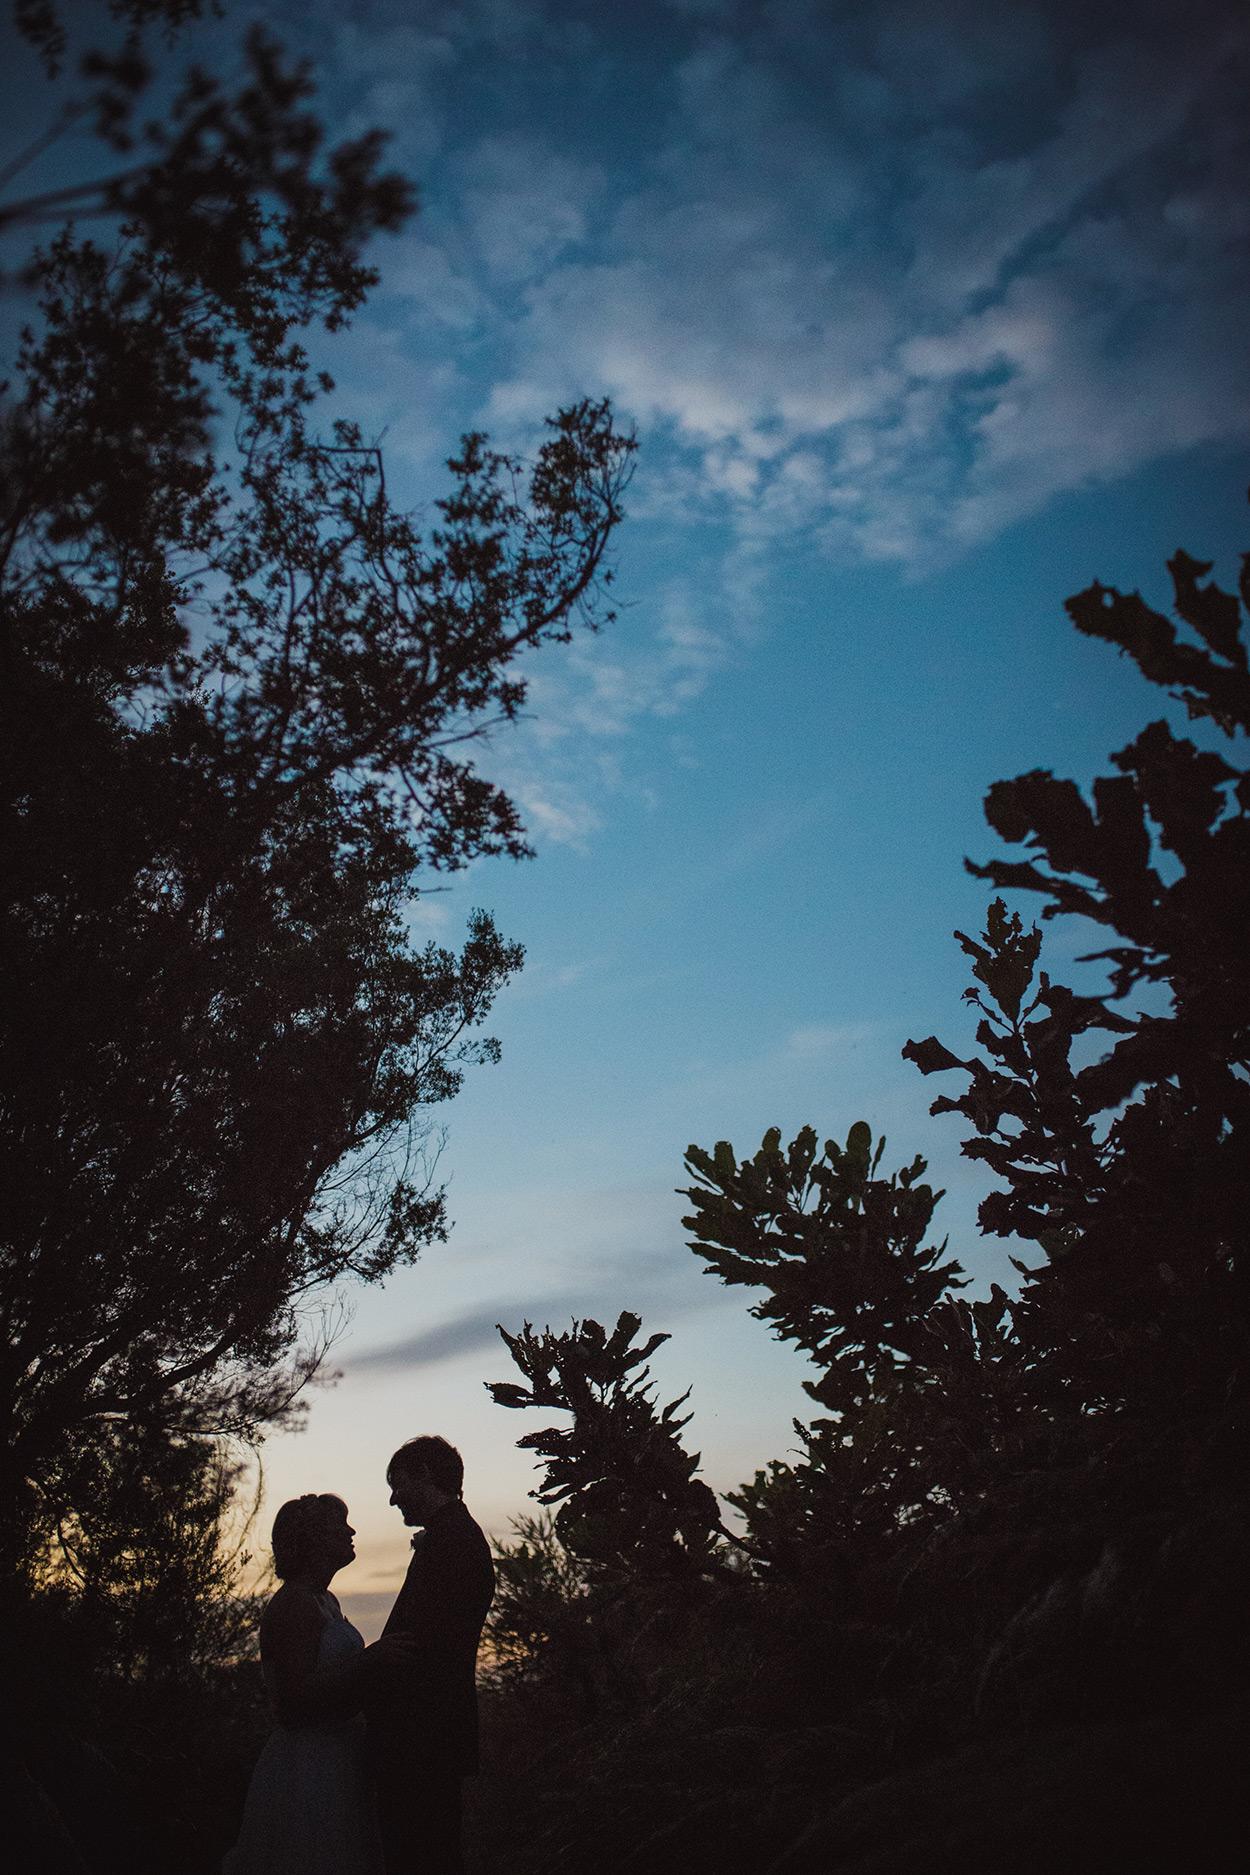 Candid Noosa & Bangalow Destination Wedding Photos - Sunshine Coast, Queensland, Australian Photographer Blog